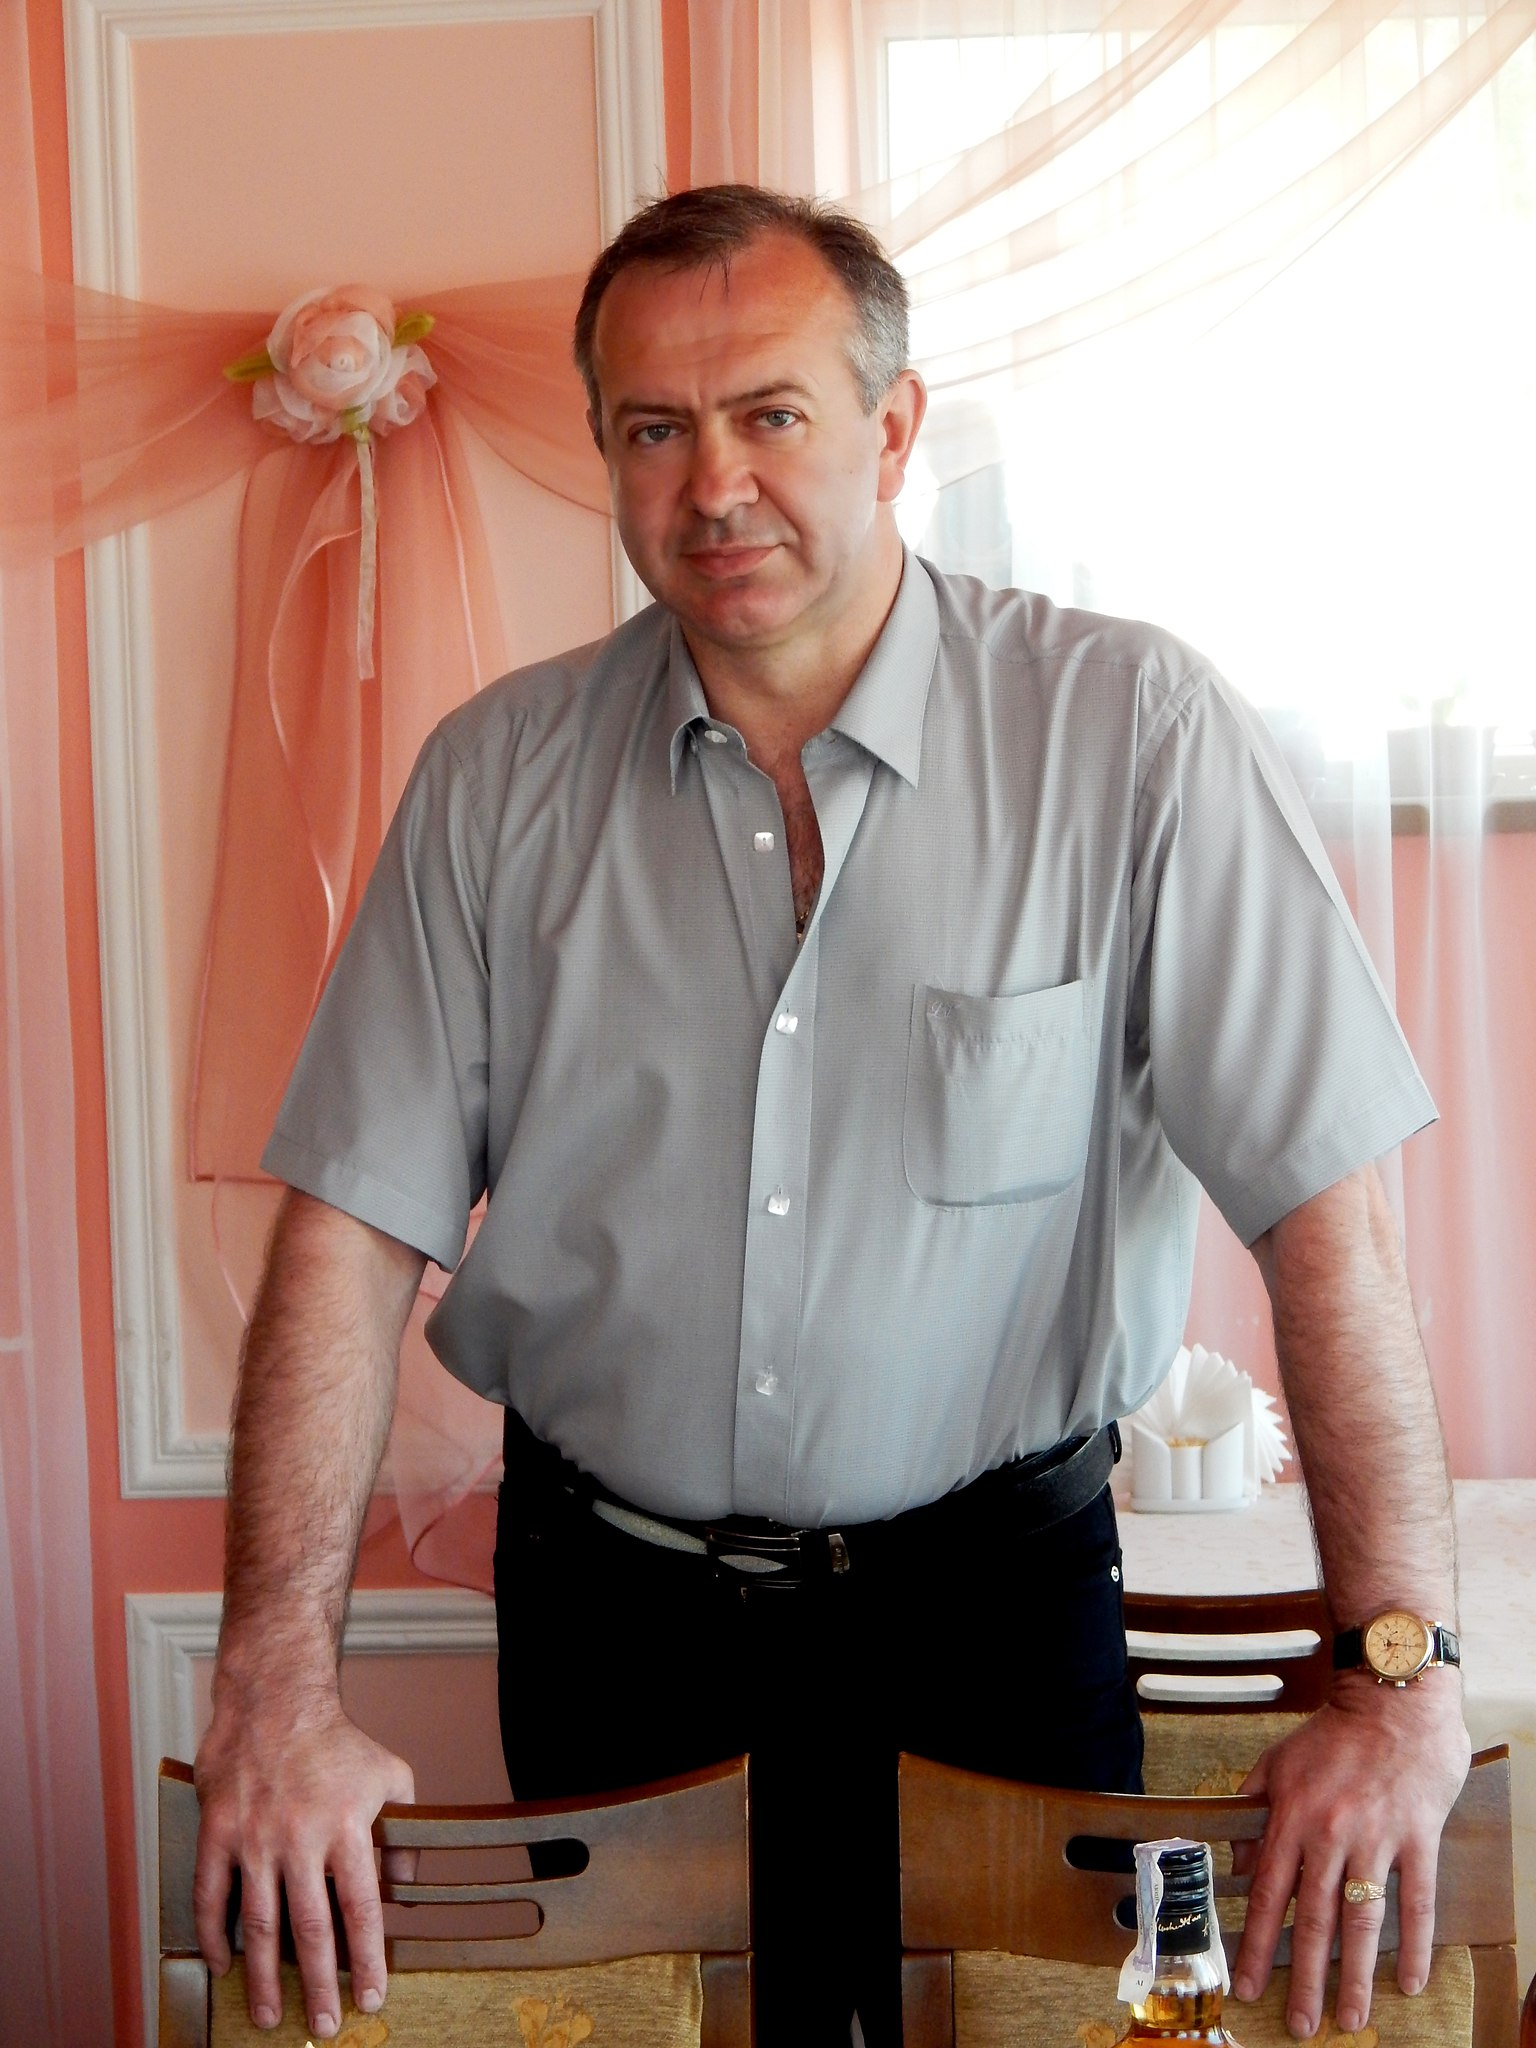 Мужчины 50 лет фото знакомство